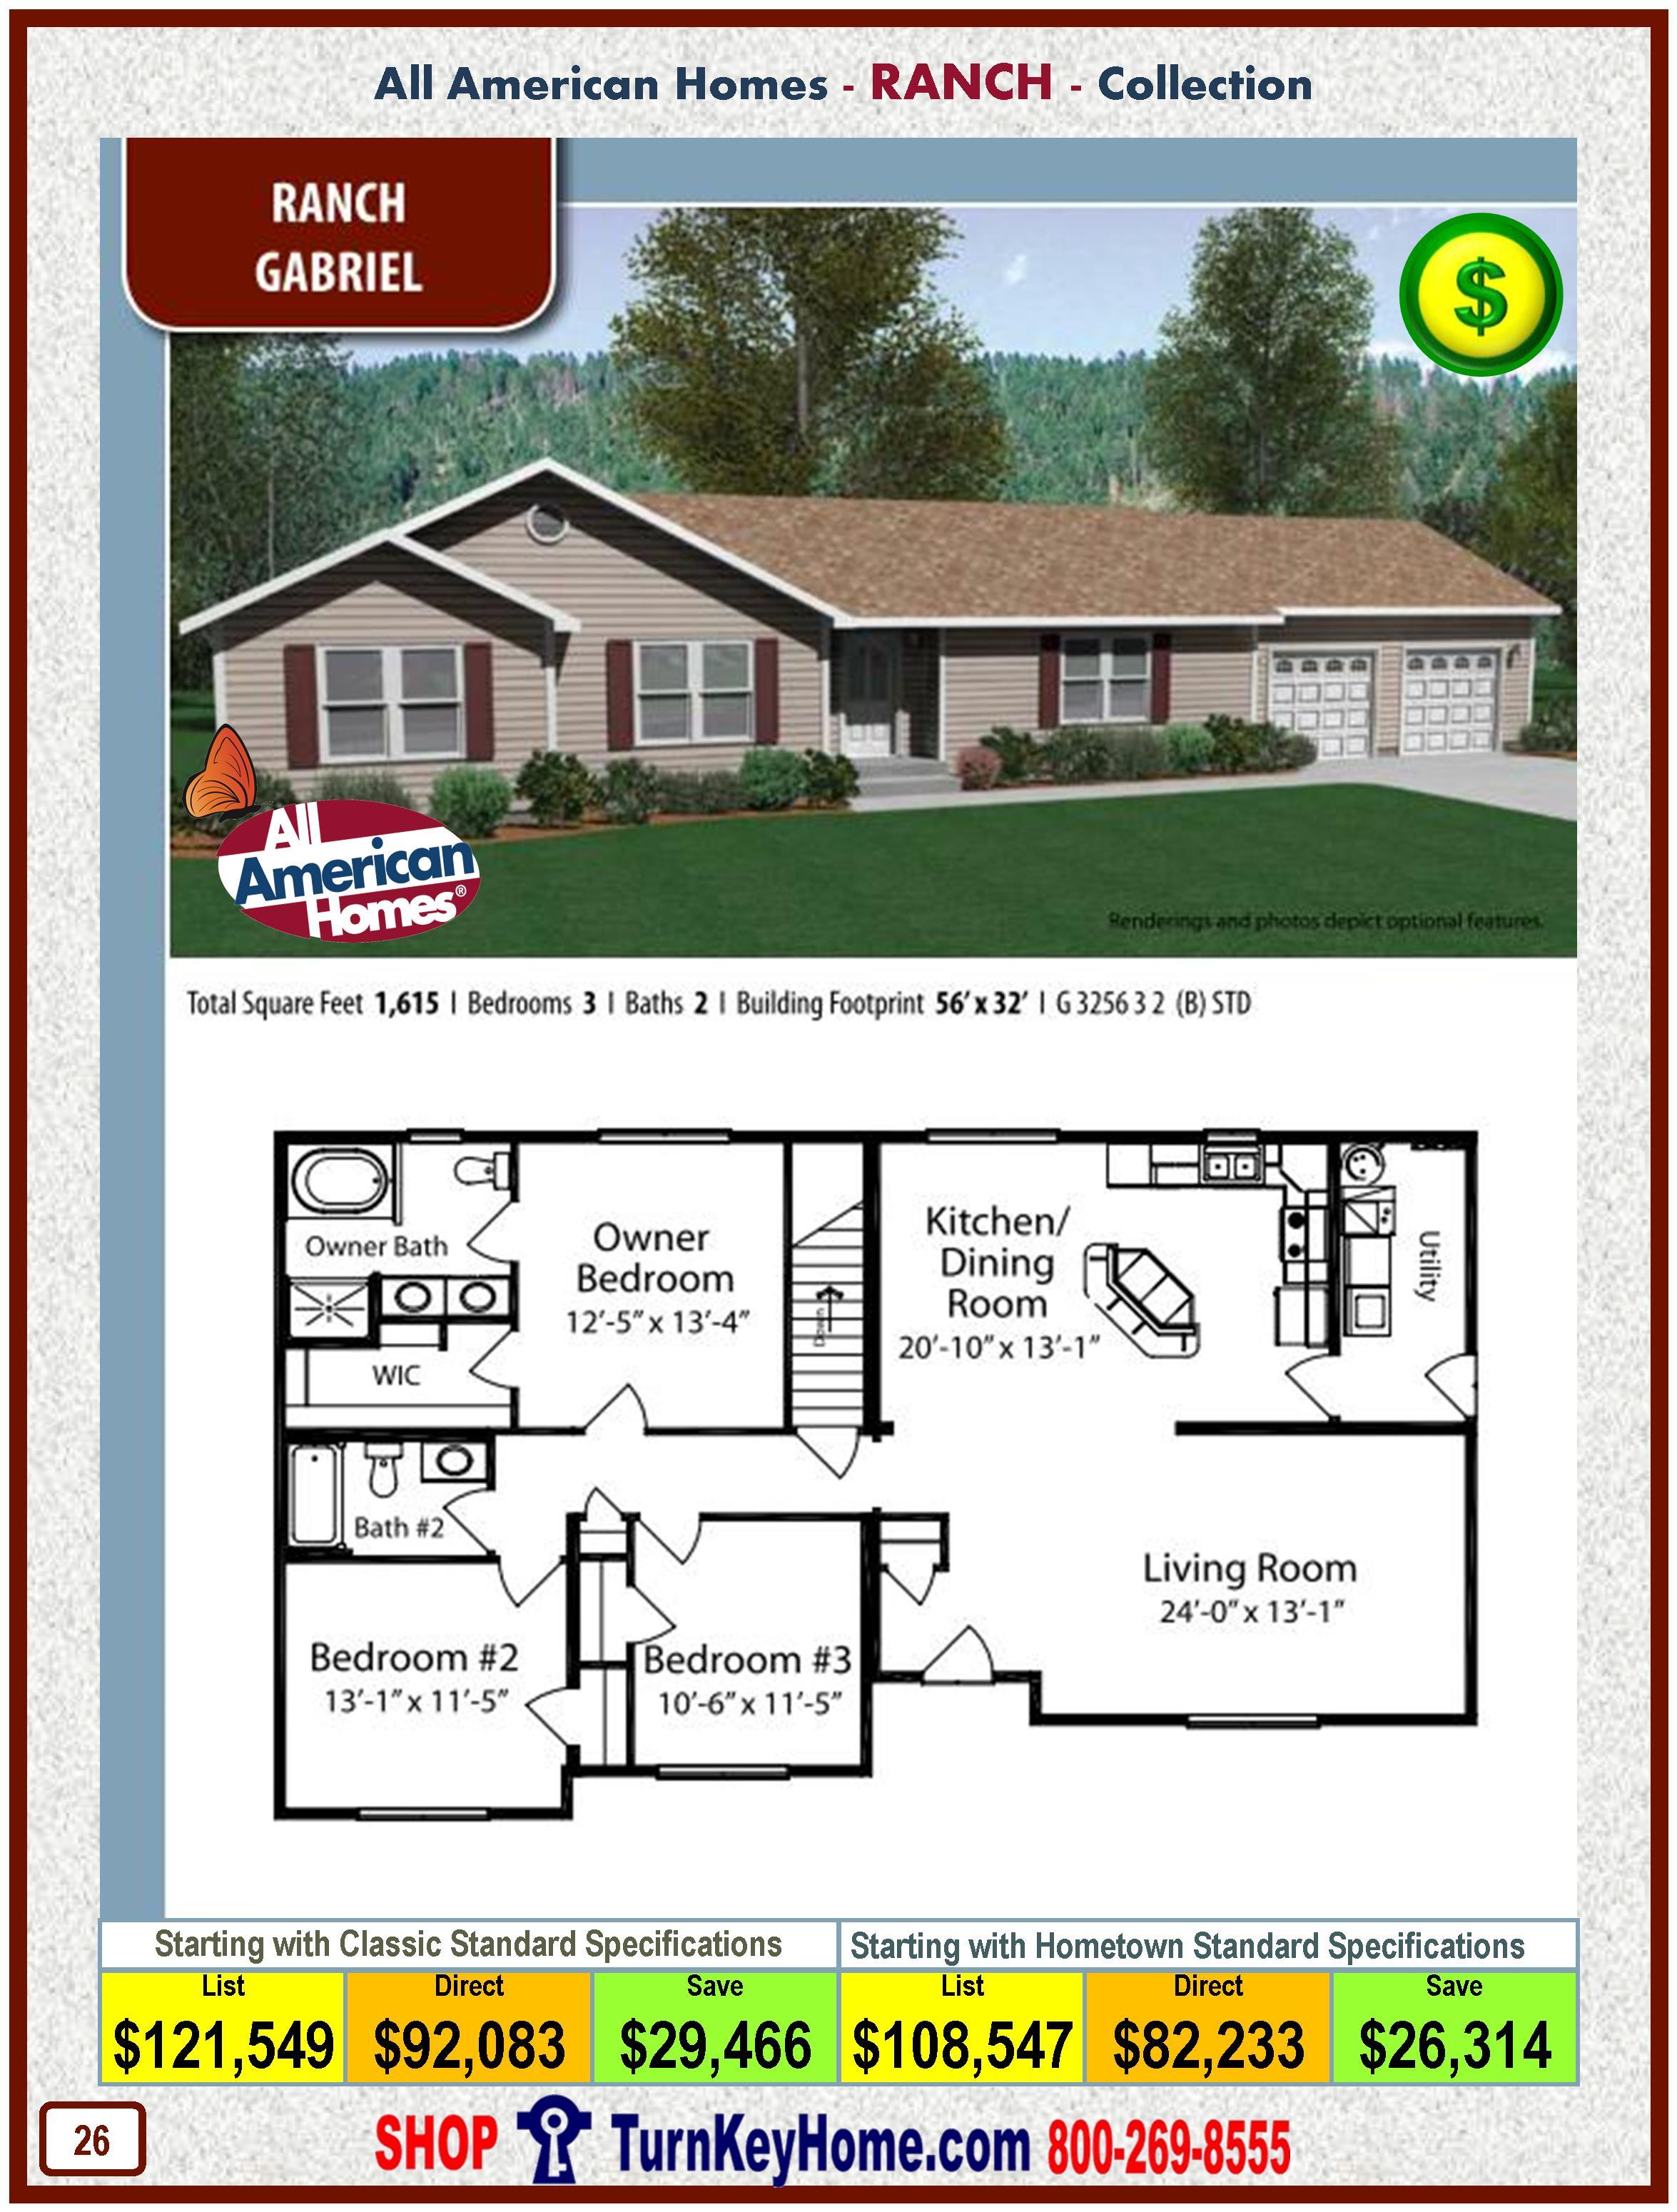 gabriel all american modular home ranch collection plan price